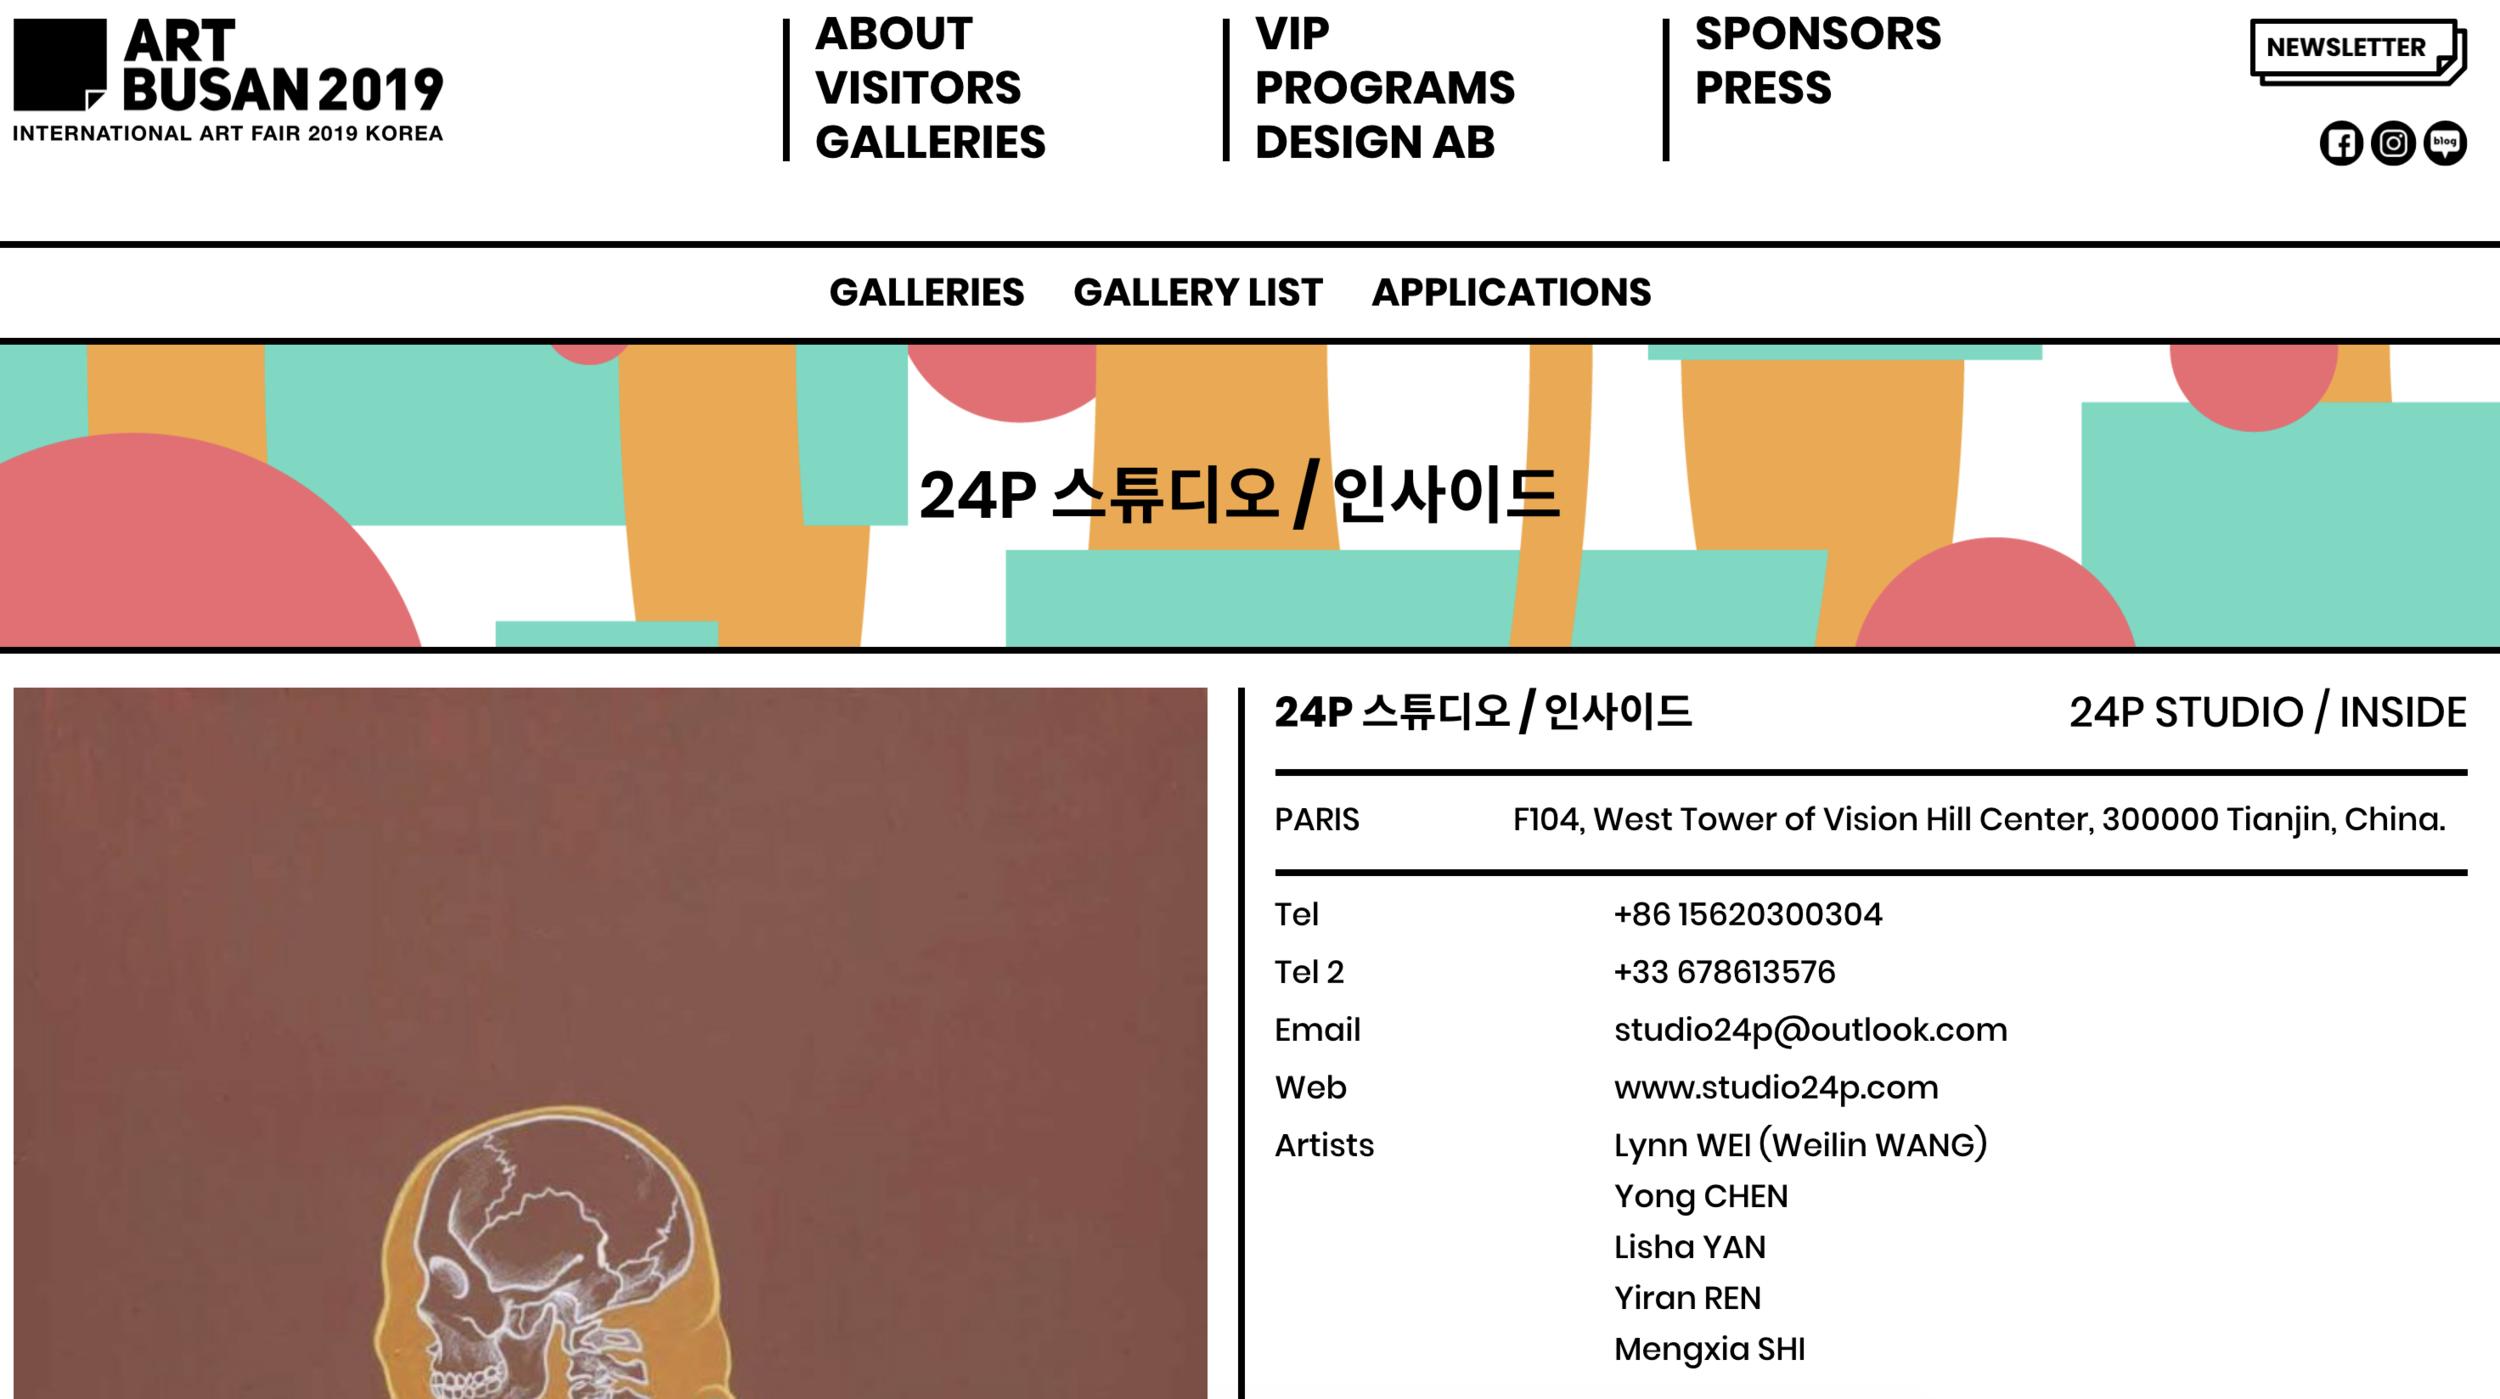 http://artbusankorea.com/project/24p-studio-inside?_sft_project_tag=abroad